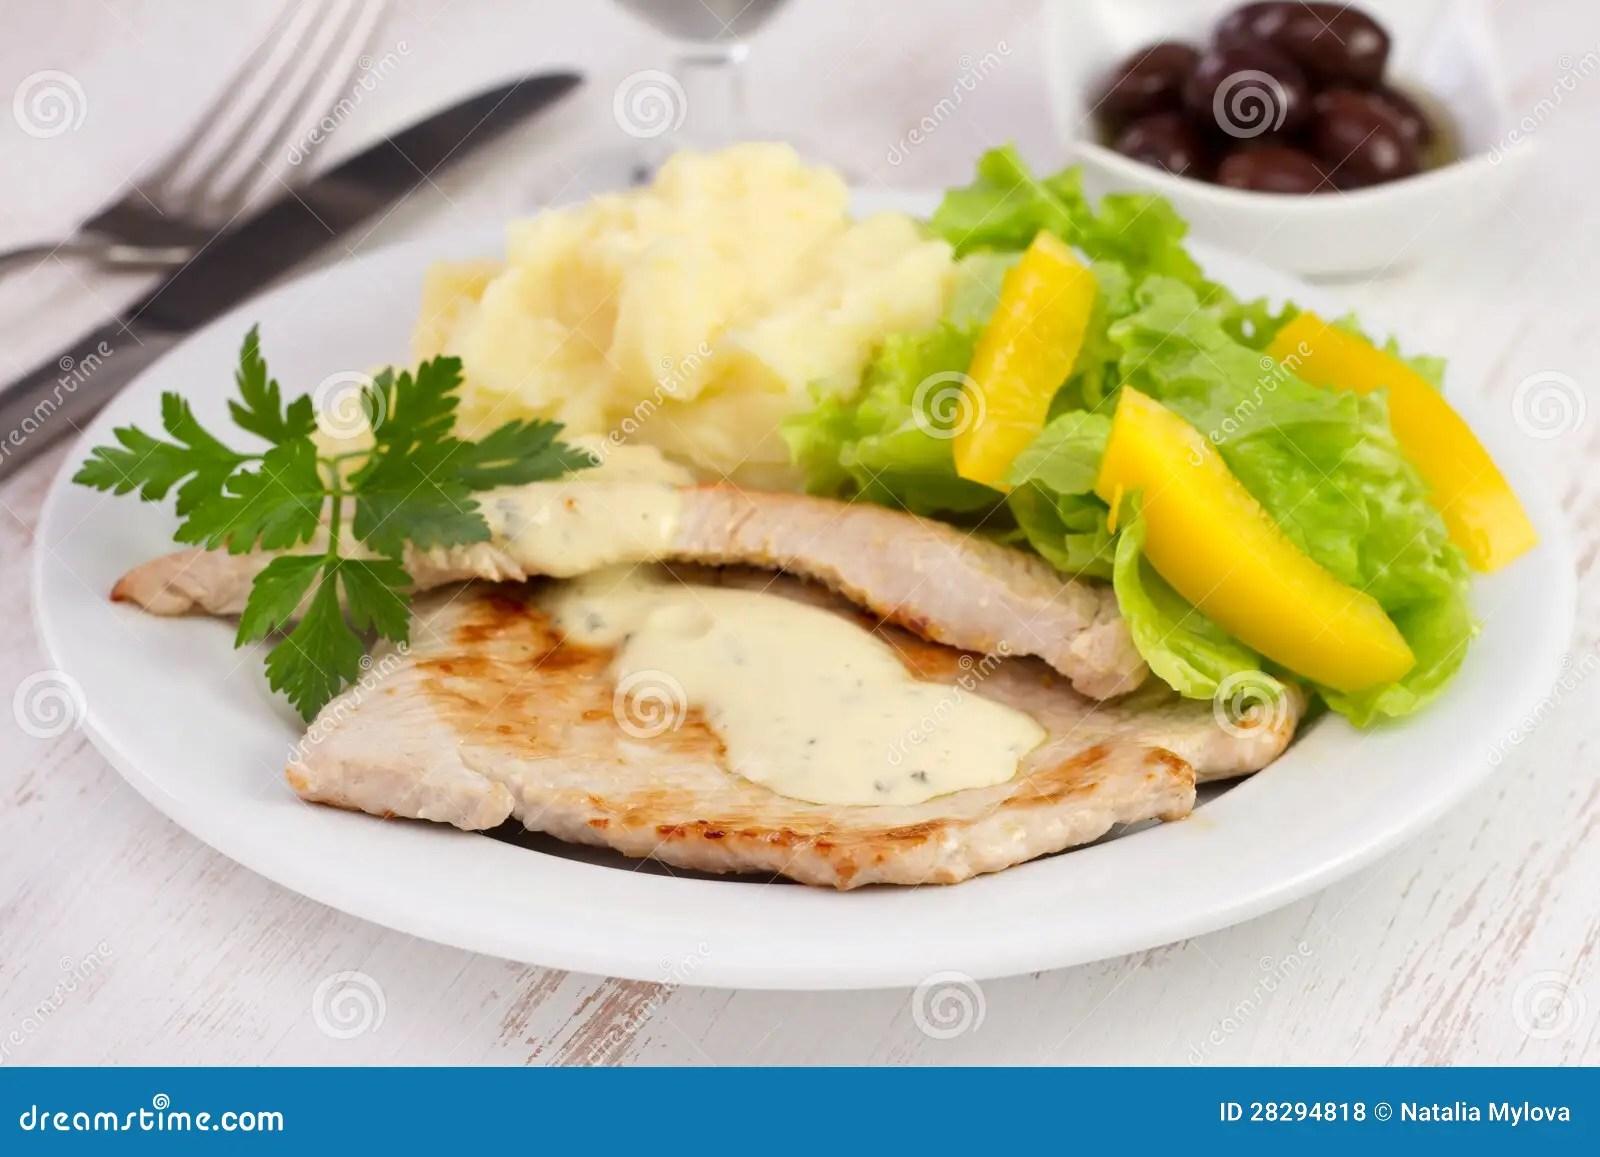 Fried Turkey With Southern Rub Recipes — Dishmaps